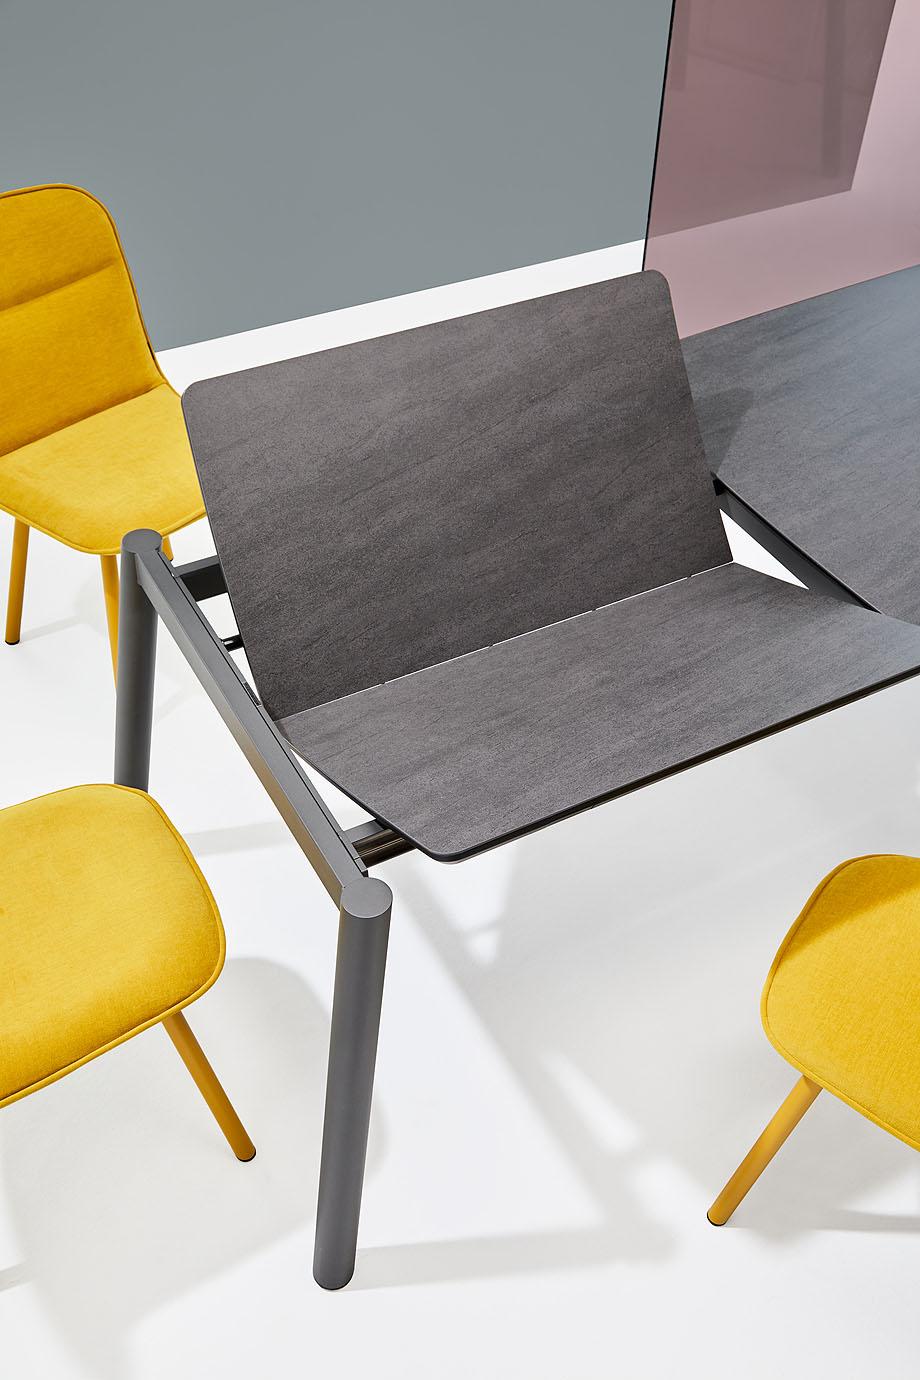 koln-yonoh-mobliberica-seating-mesa-table-comfort (4)